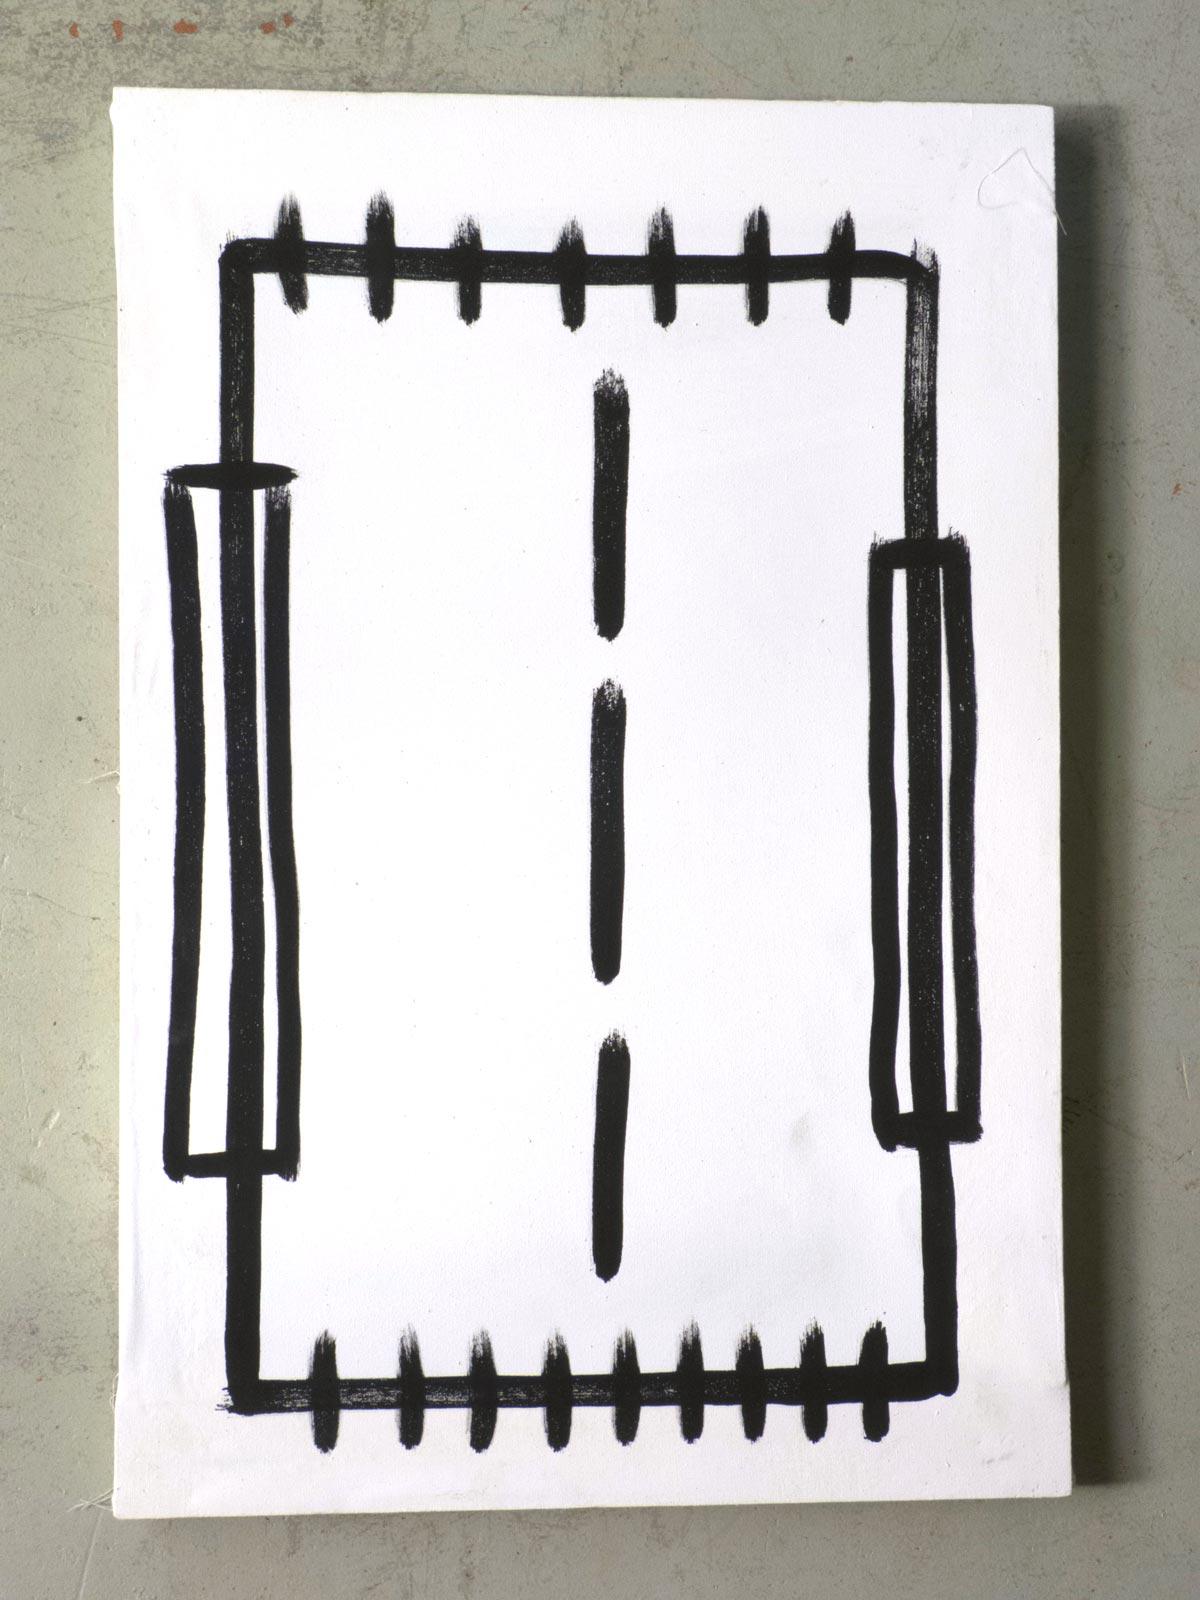 Urban-Manegold-There-is-no-Private-Privatleben-Privatsphäre-Rauminstallation-Experiment-Typographie-Portrait-Gesellschaft-Licht-Kunst-Transparent-LED-Madlight-portrait_multiplex_2